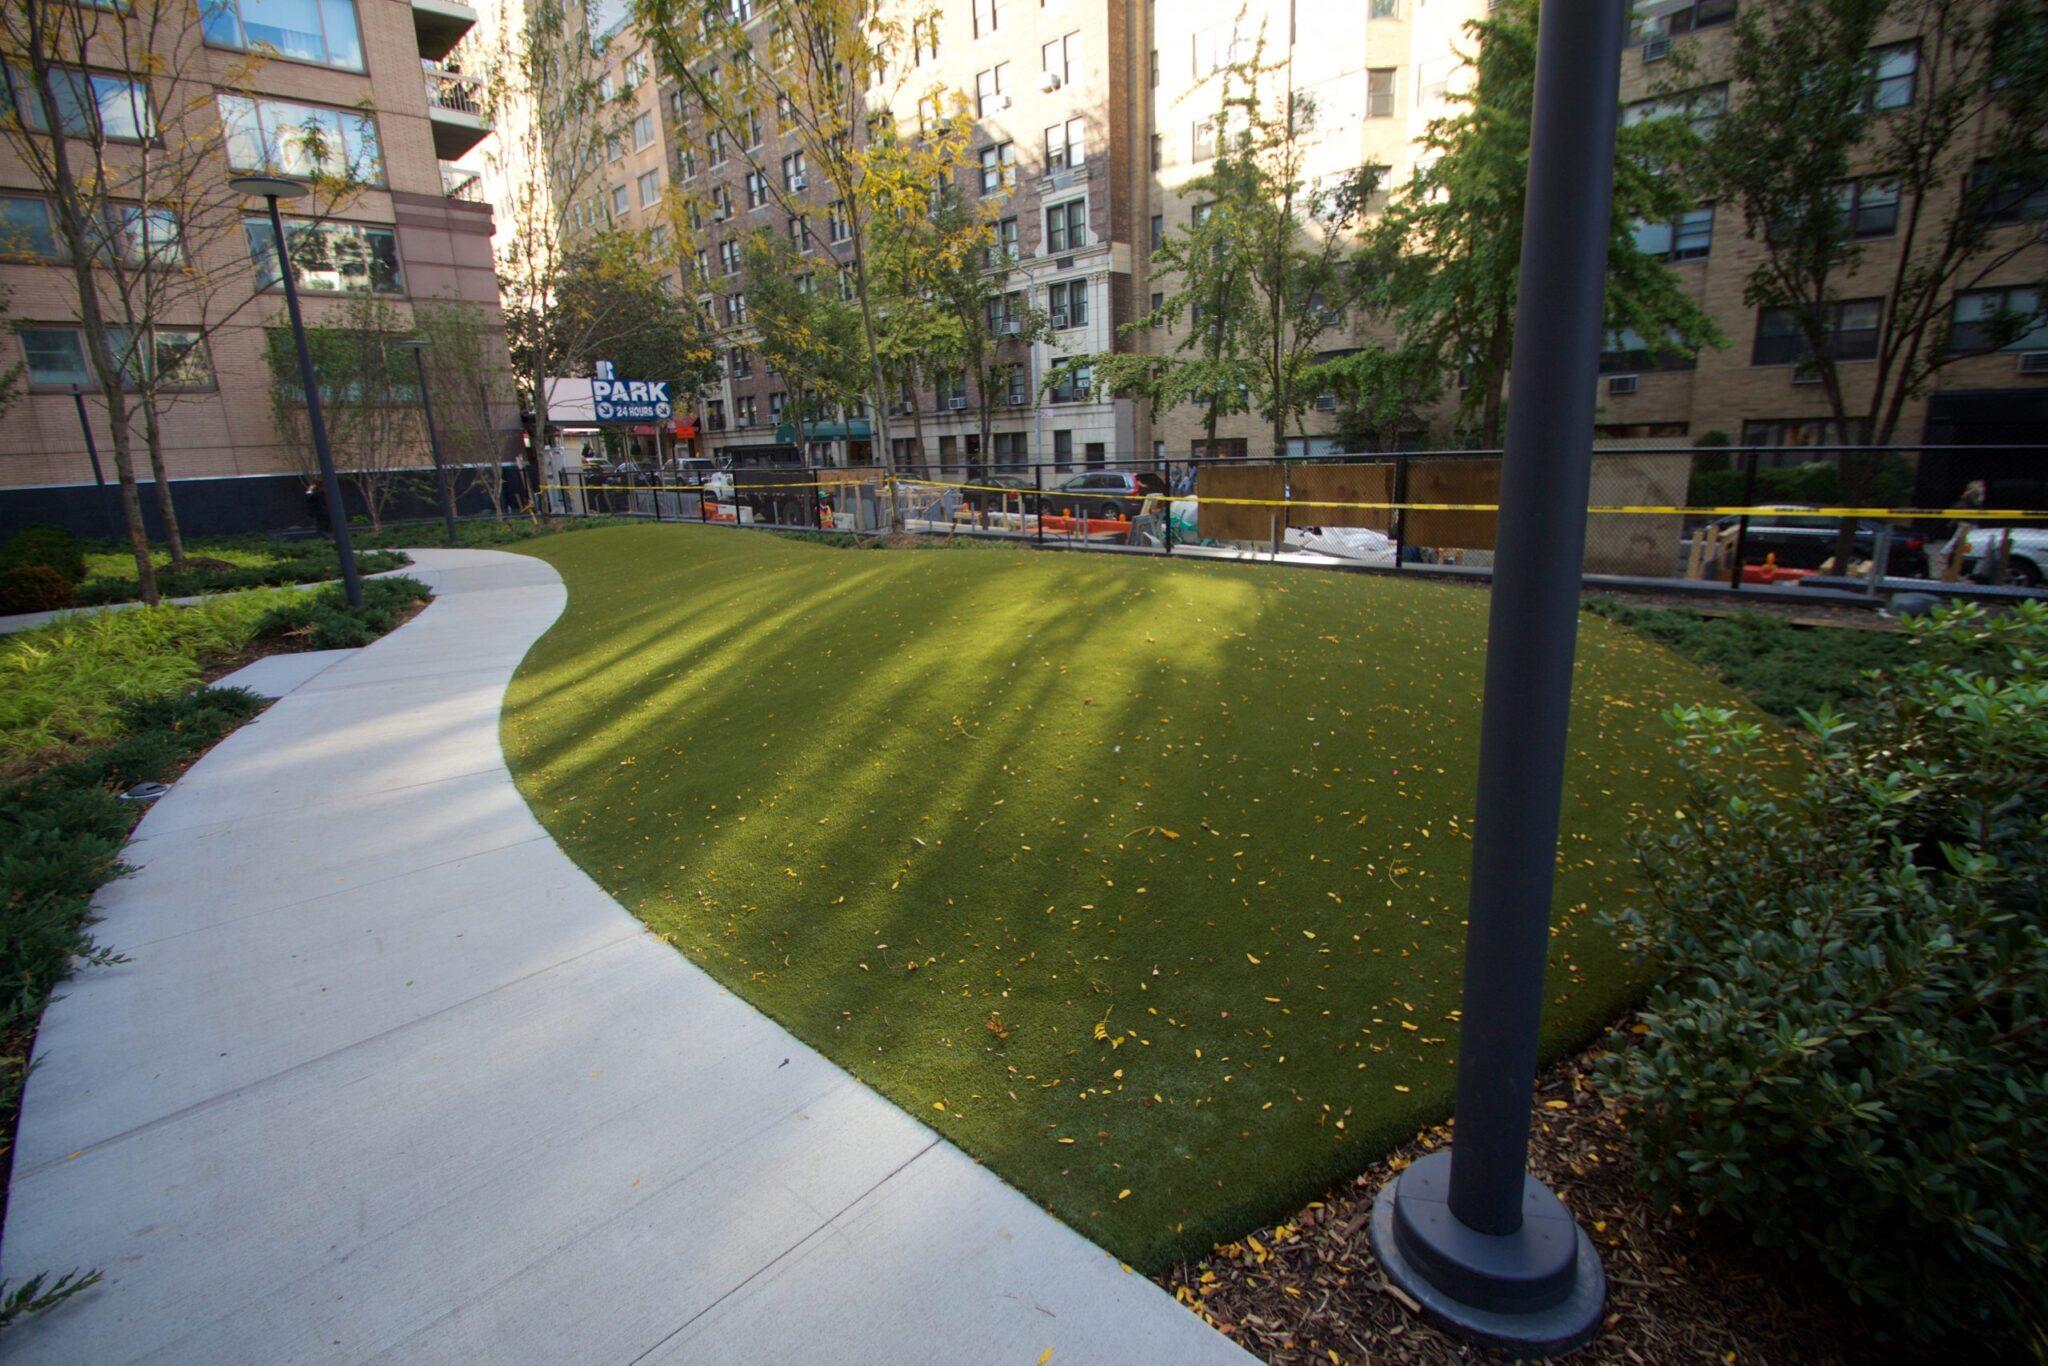 artificial grass, commercial park